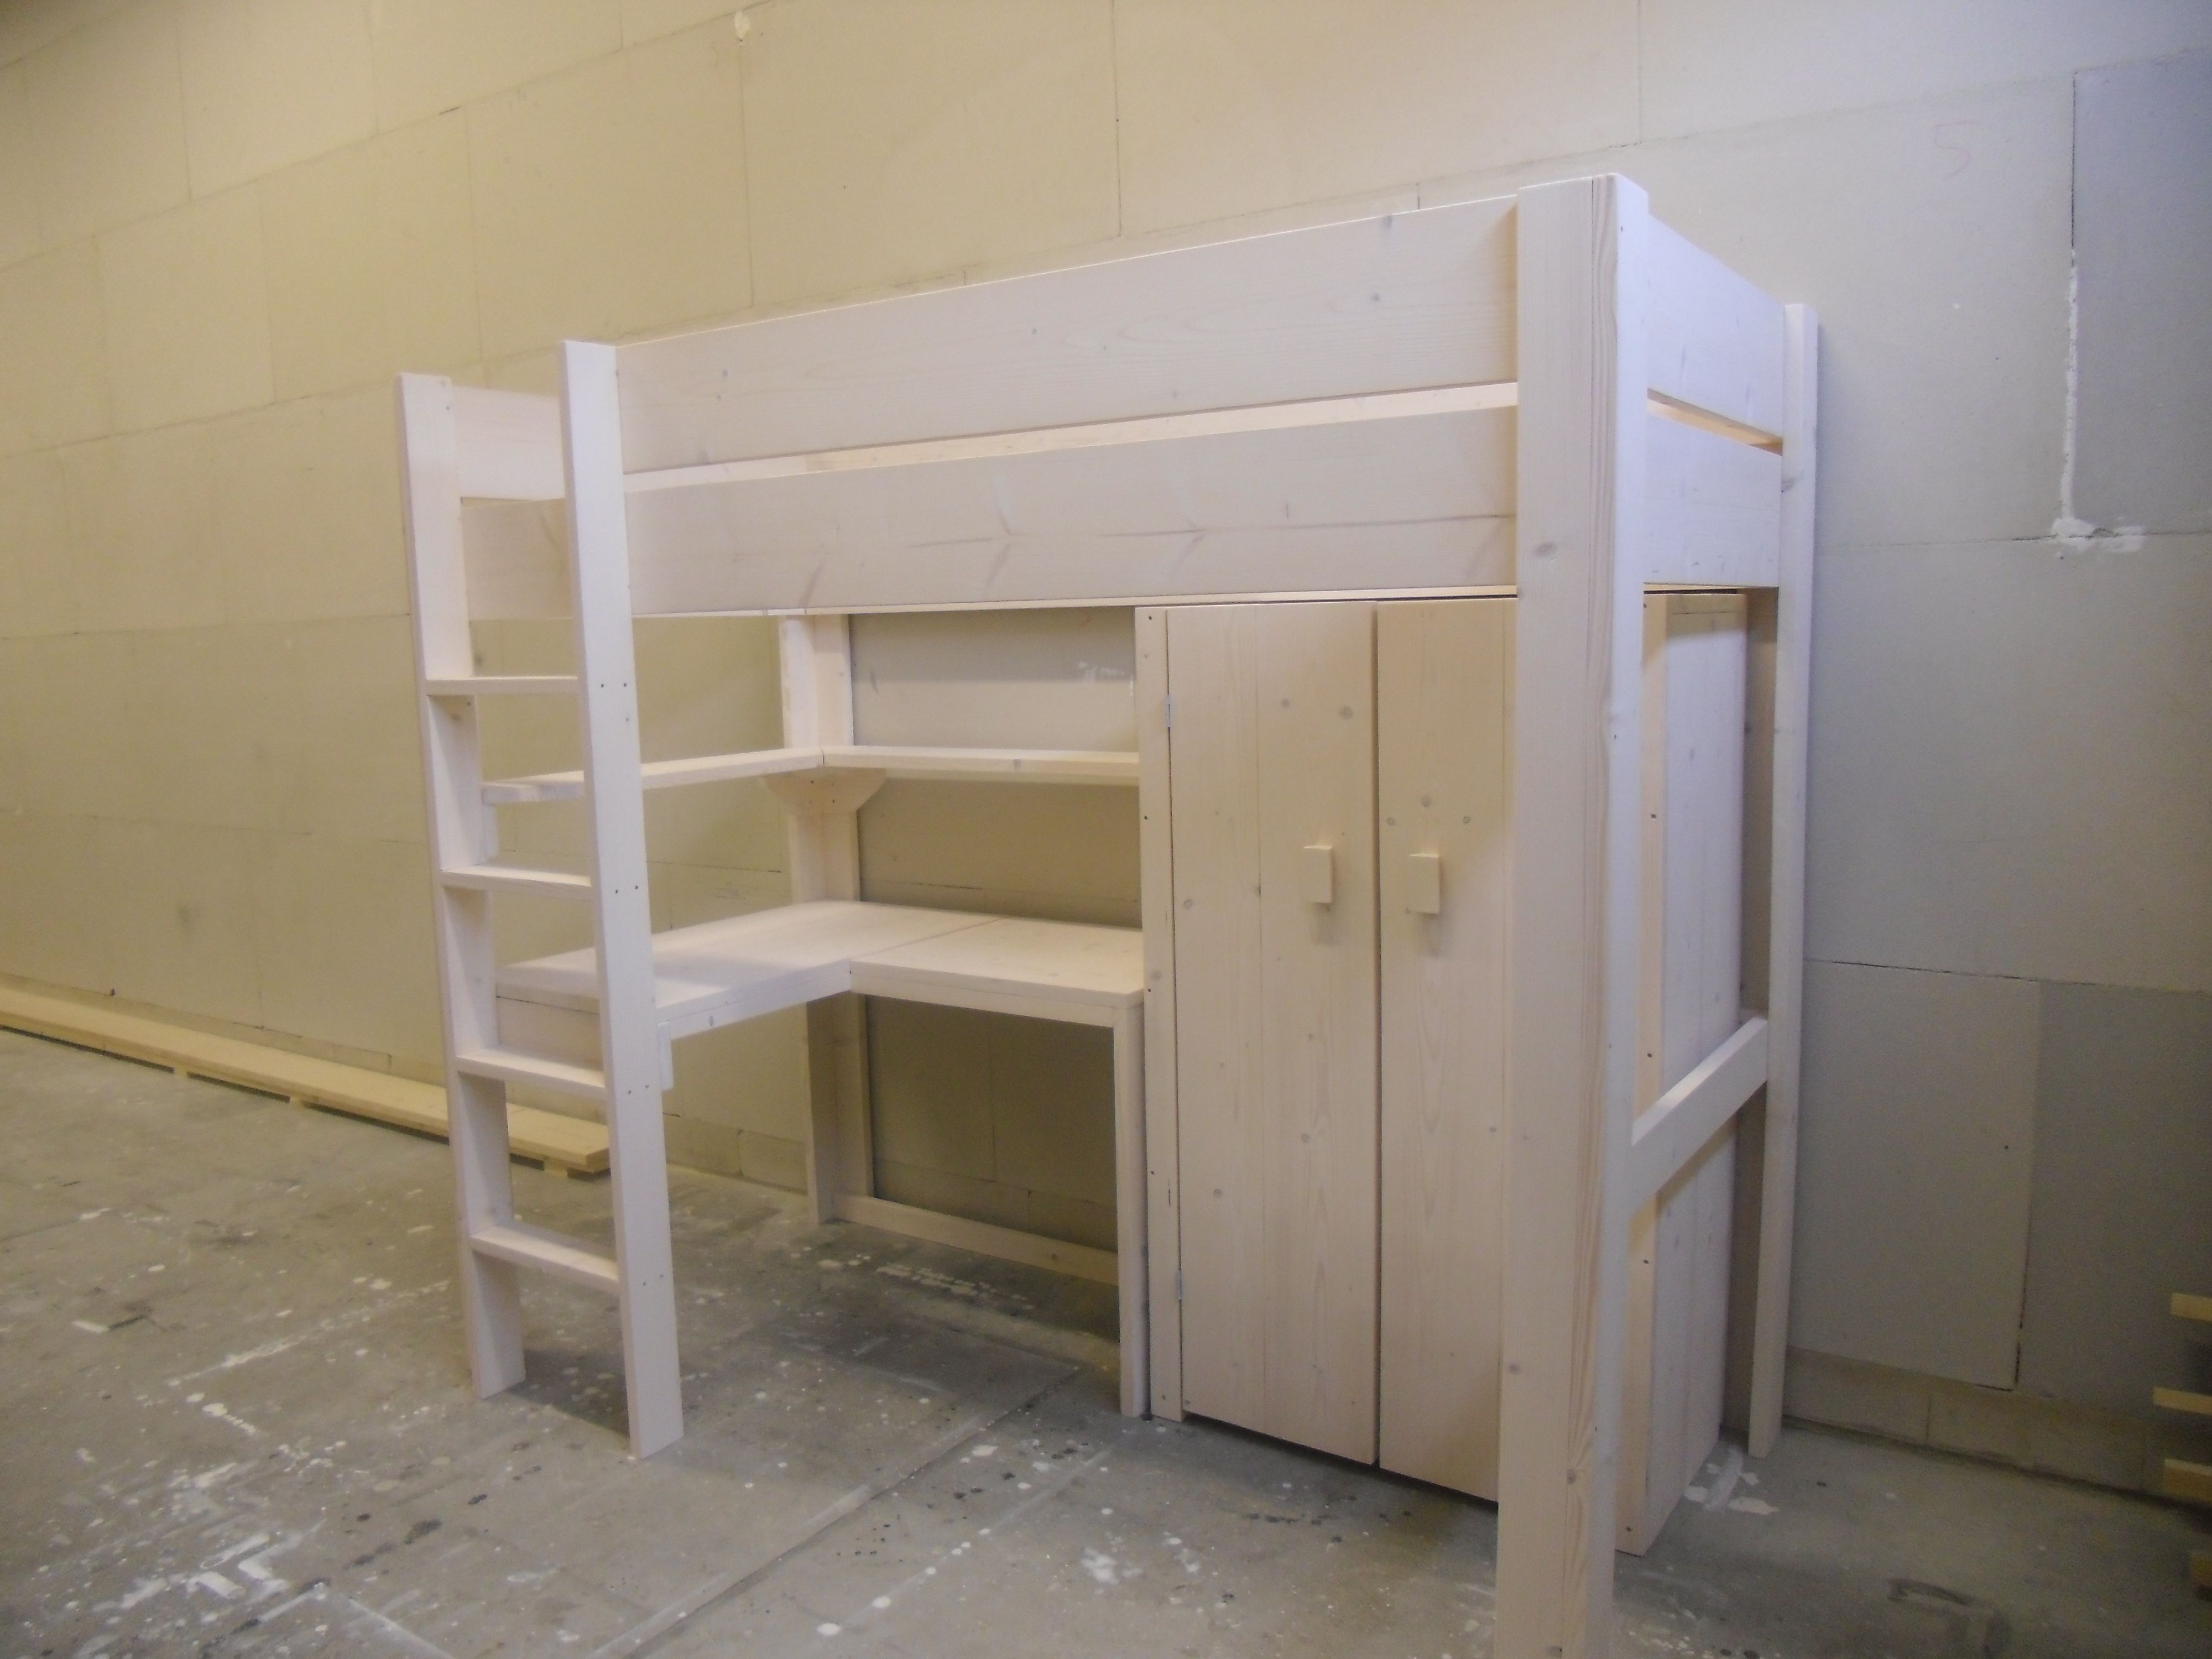 Ikea bureau kast yamai